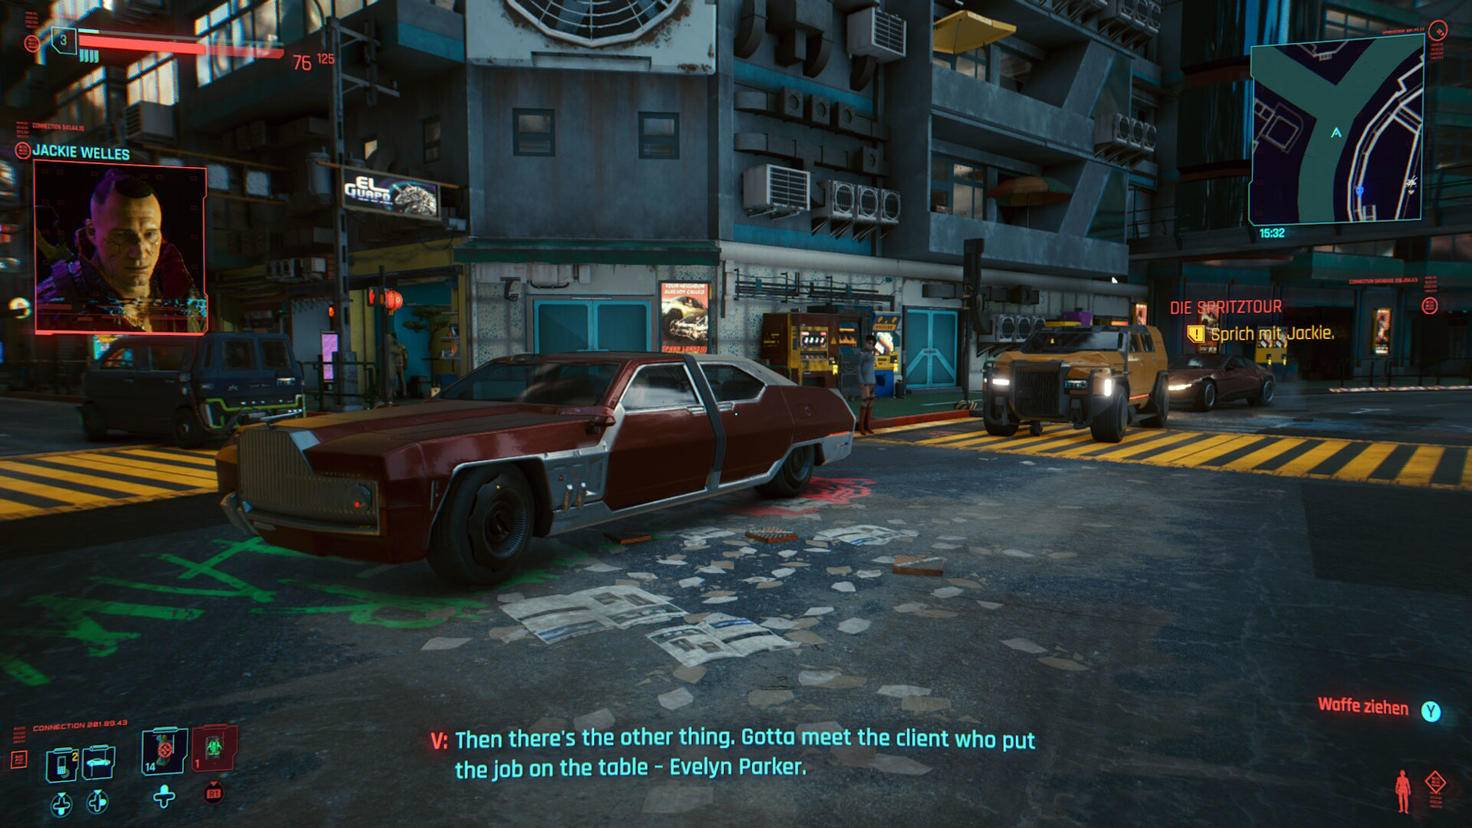 cyberpunk-2077-stadia-screenshot-01